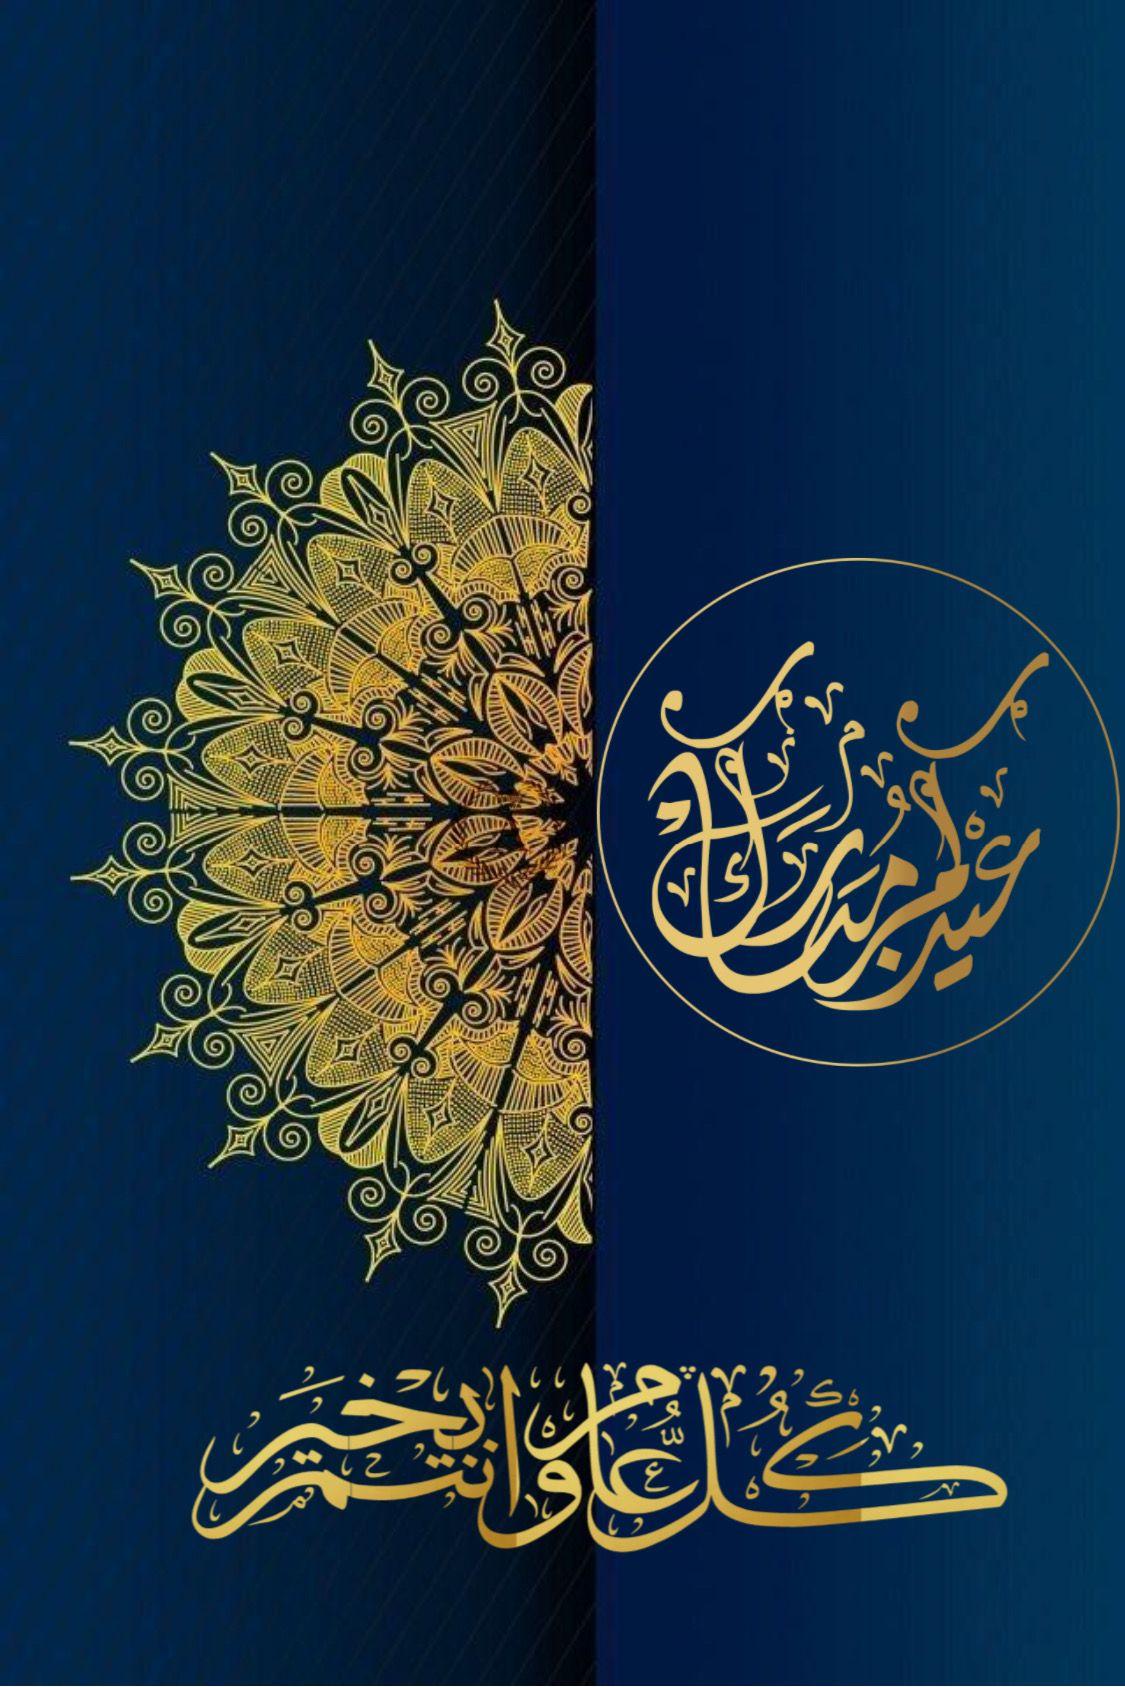 تهاني عيد الفطر 2019 Eid Stickers Eid Greetings Eid Cards